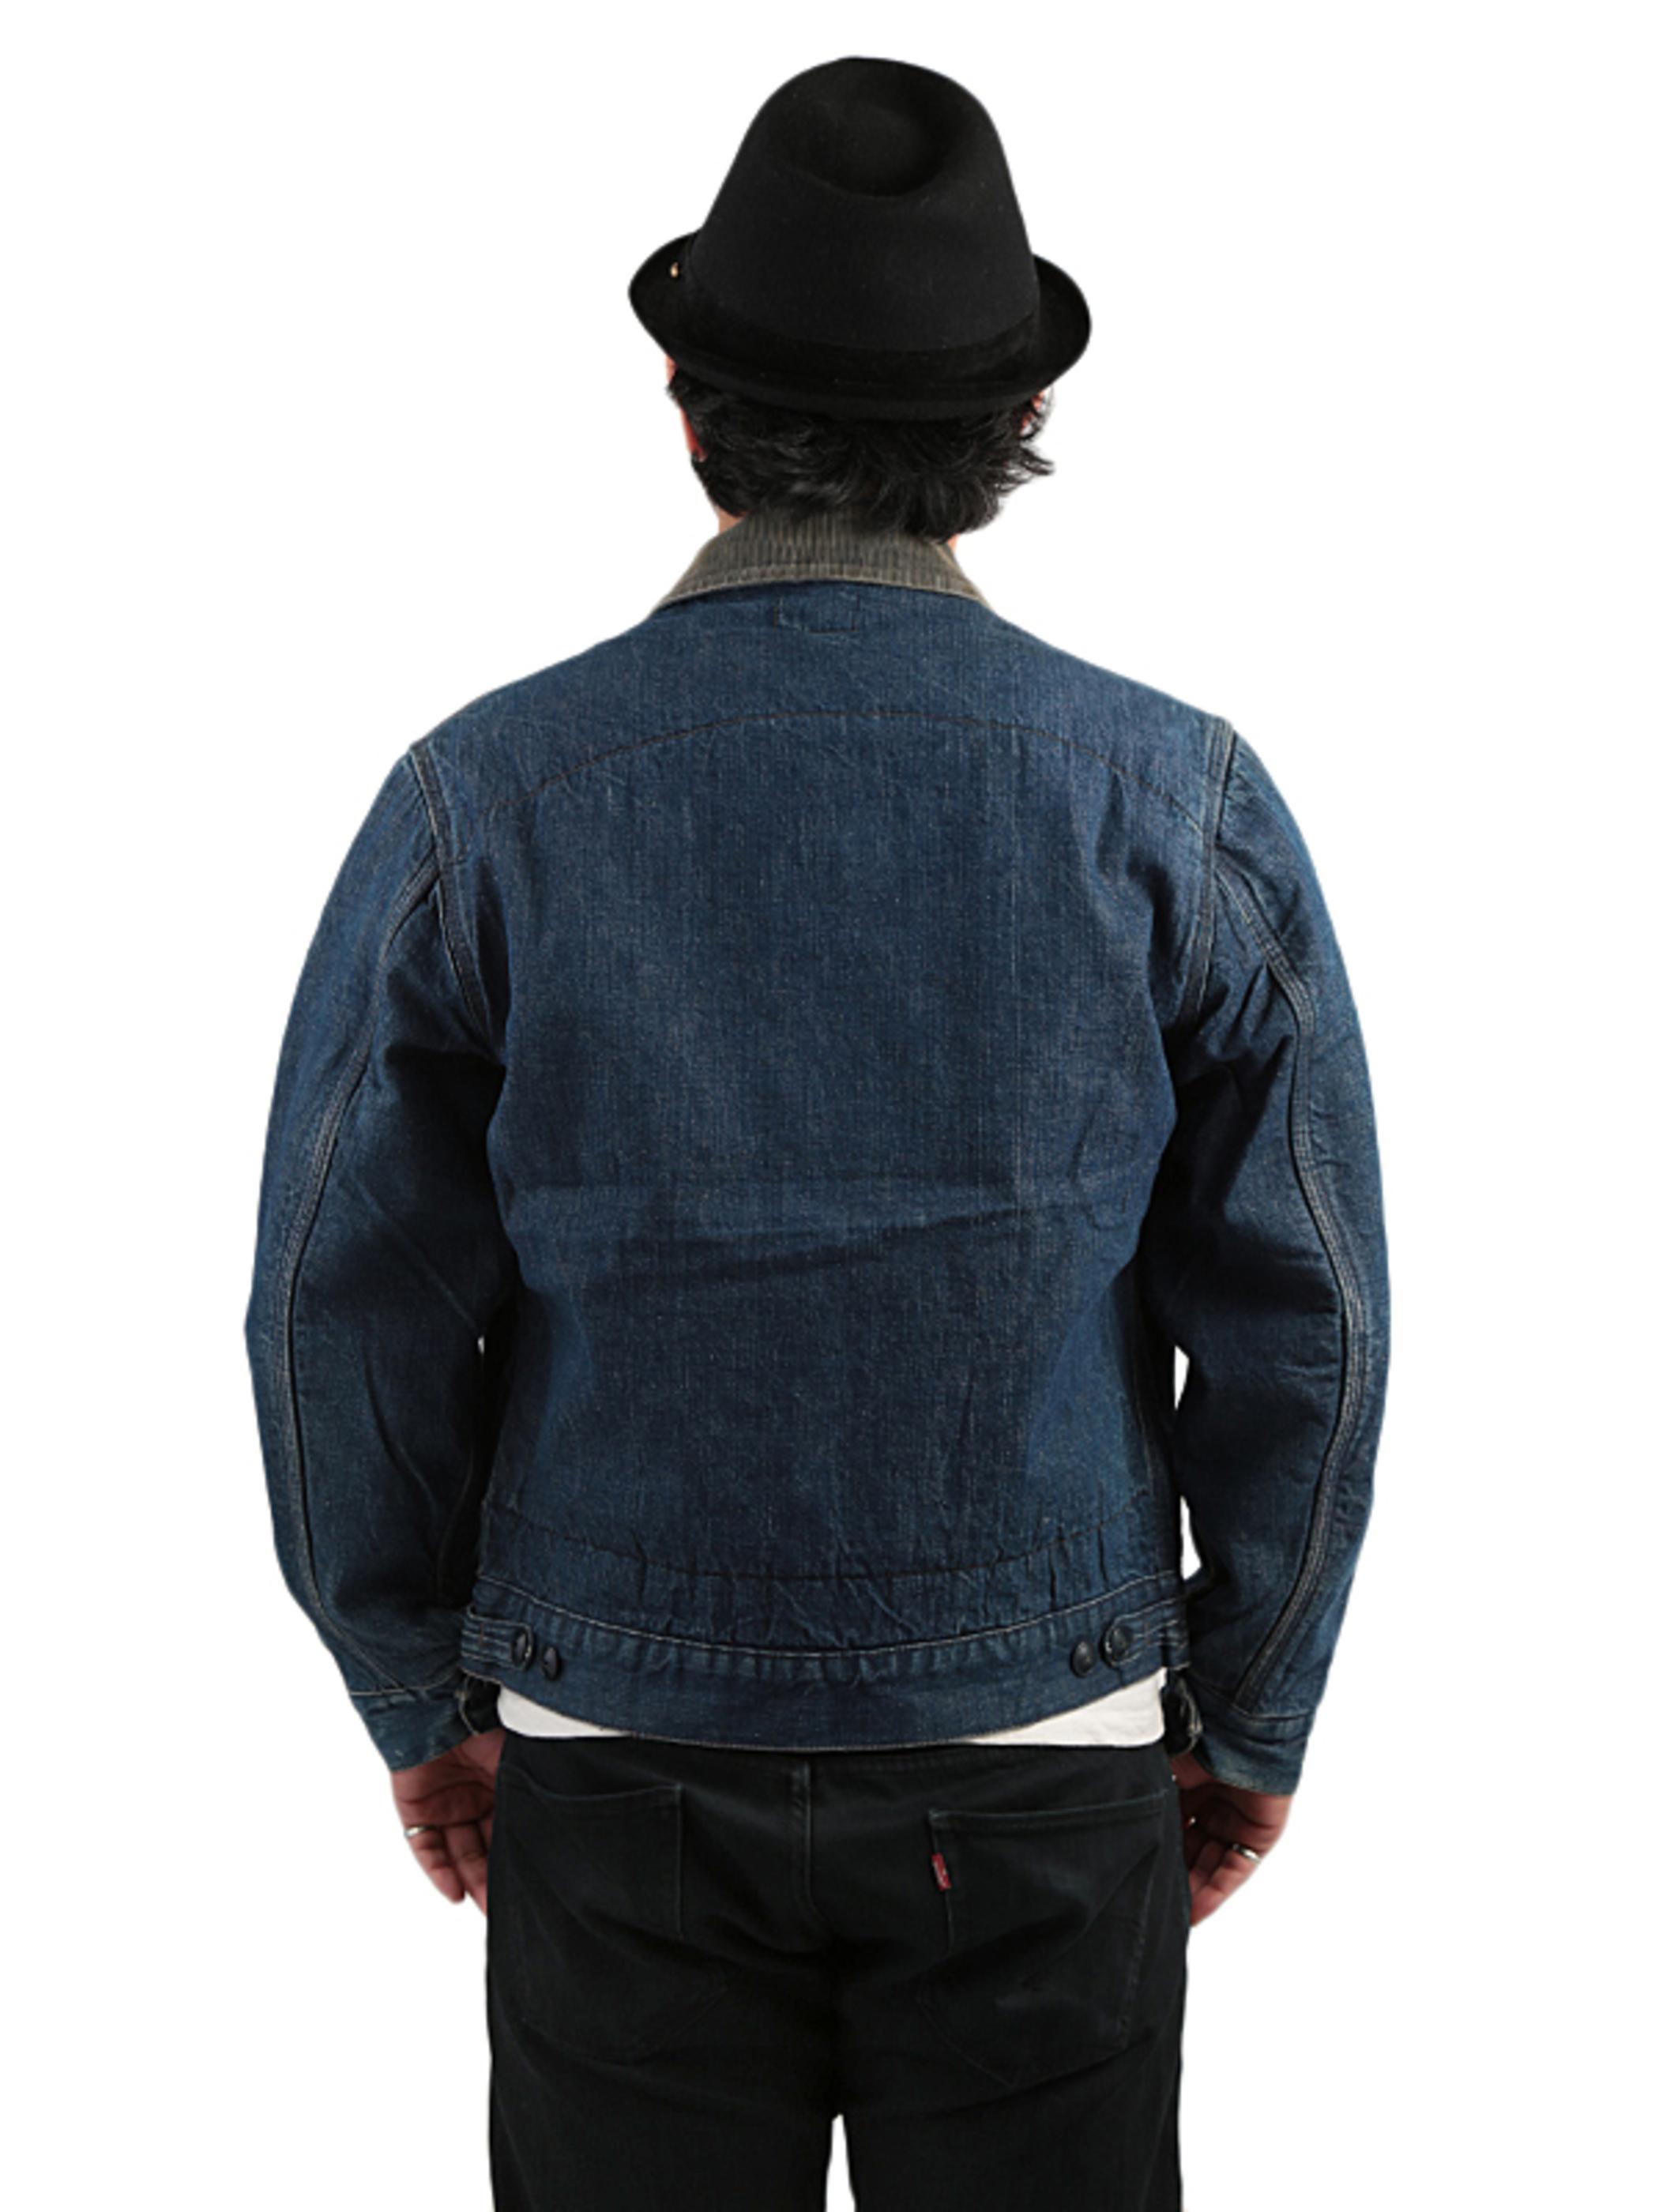 Used / Power House / 1960's Vintage / Denim Jacket